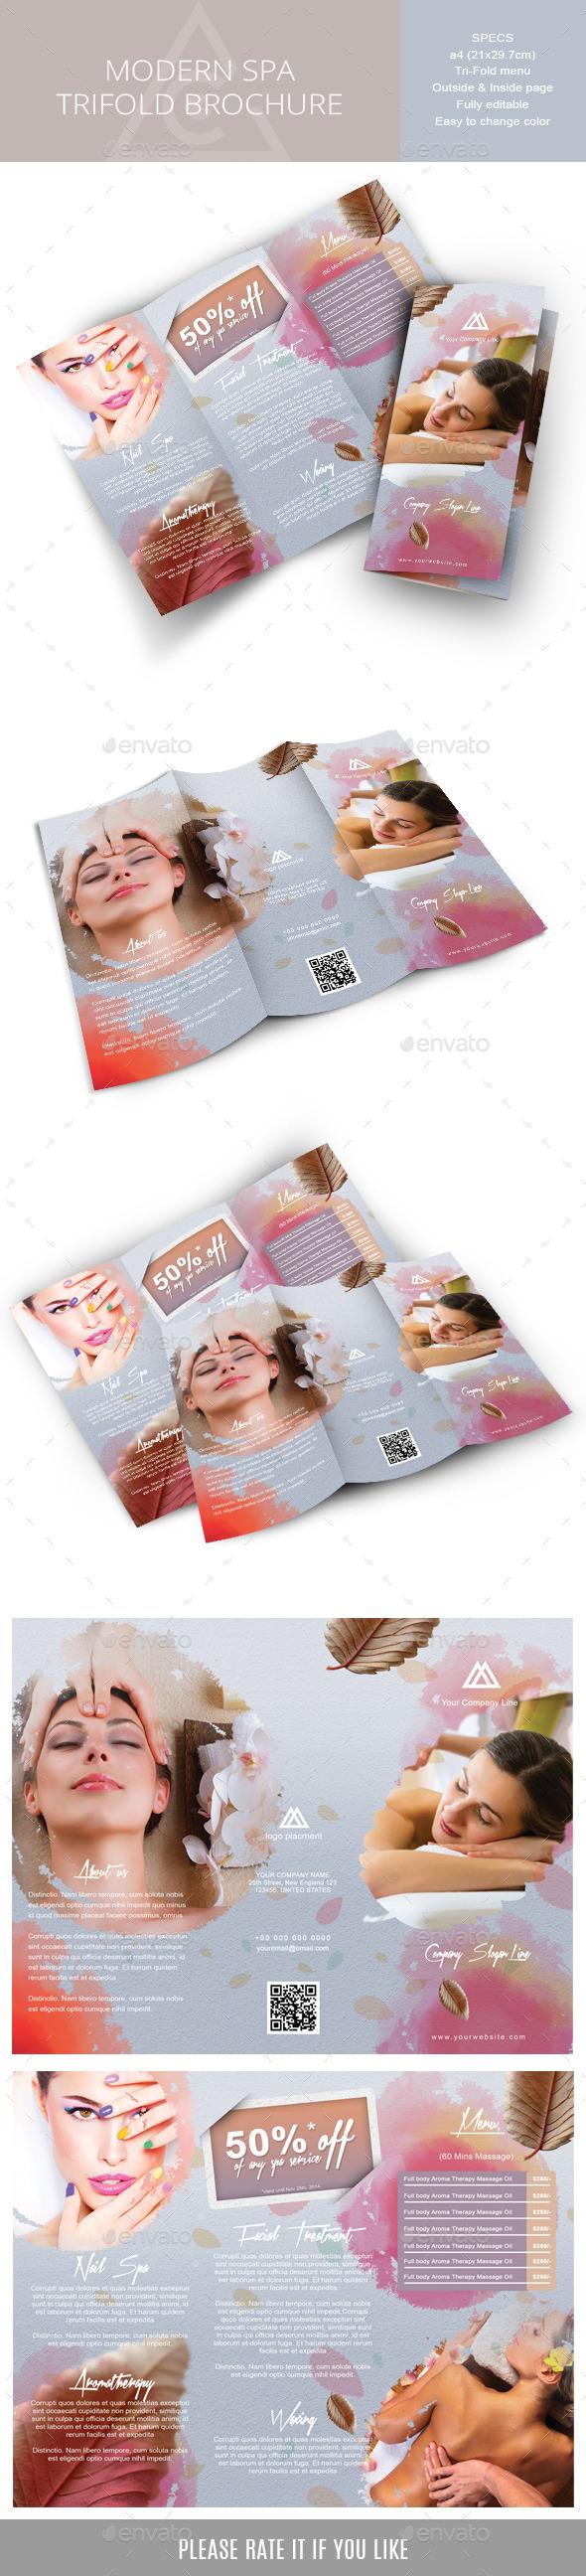 GraphicRiver Tri-fold brochure for Spa or Body-care Business 9000495